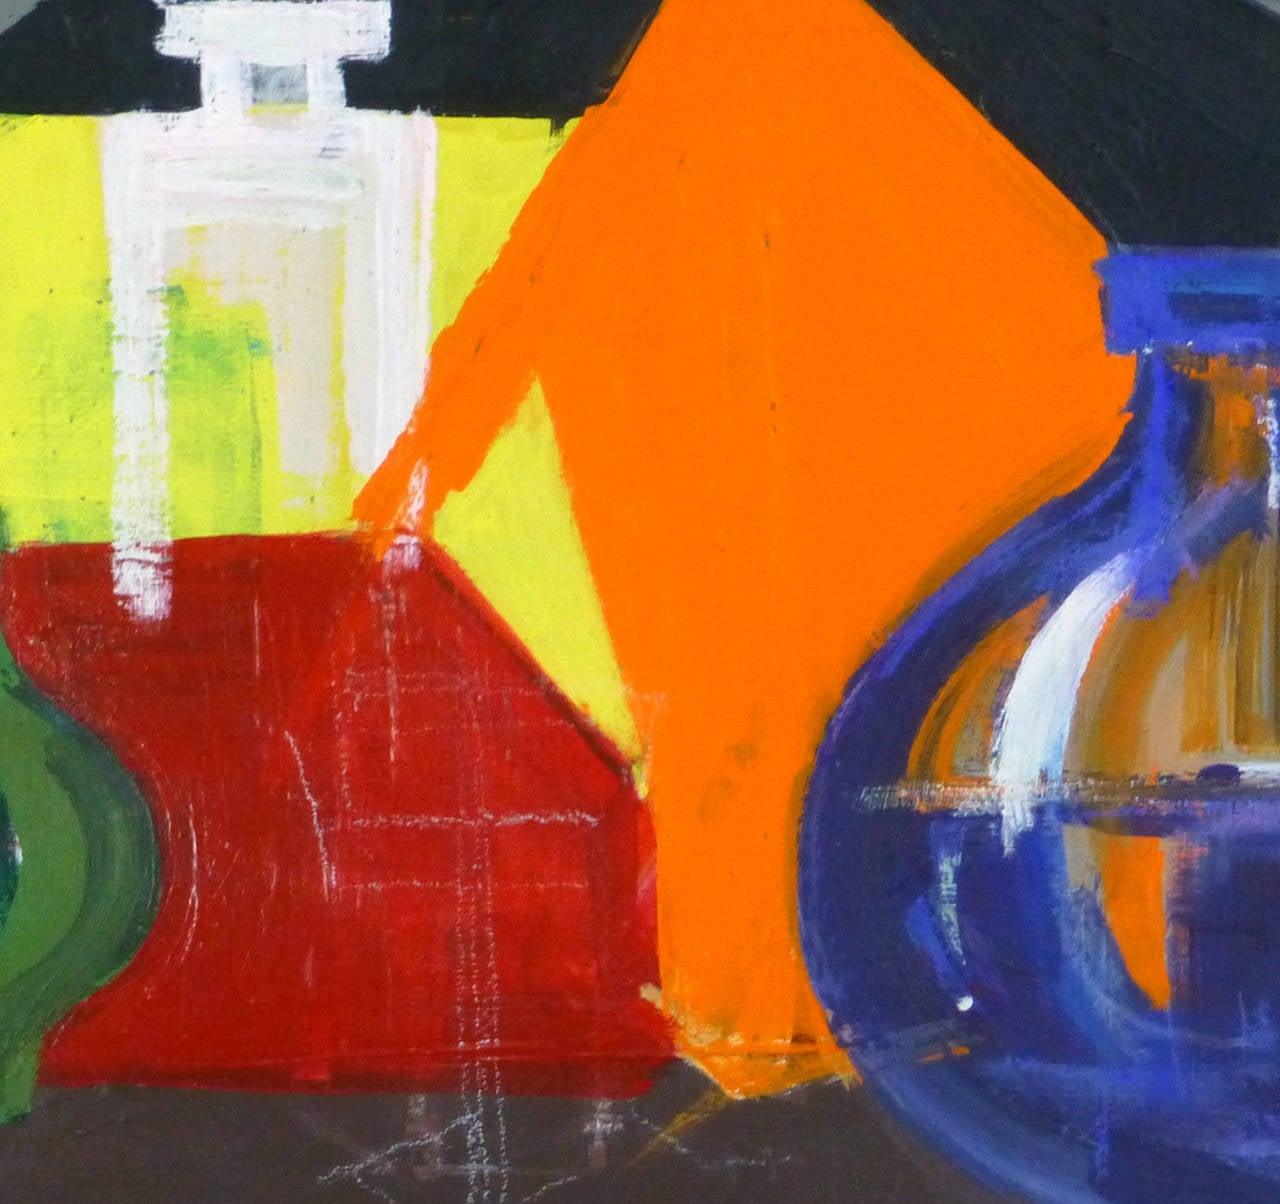 Purple Bowls Wine Bottels Modern Canvas Painting Wall Art: Vintage Abstract Still Life